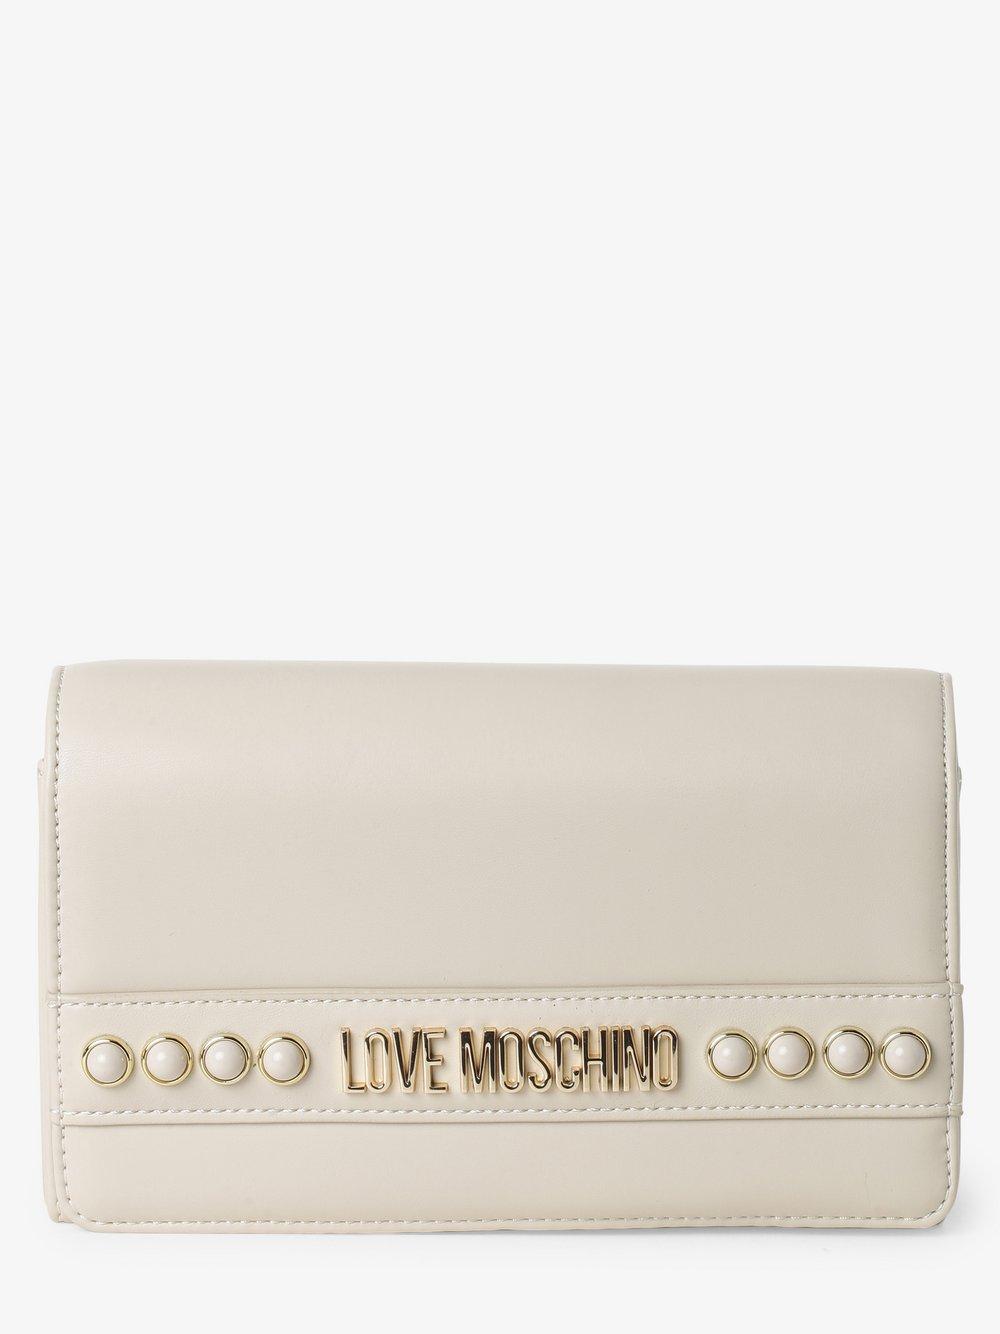 Love Moschino - Damska torebka na ramię, beżowy